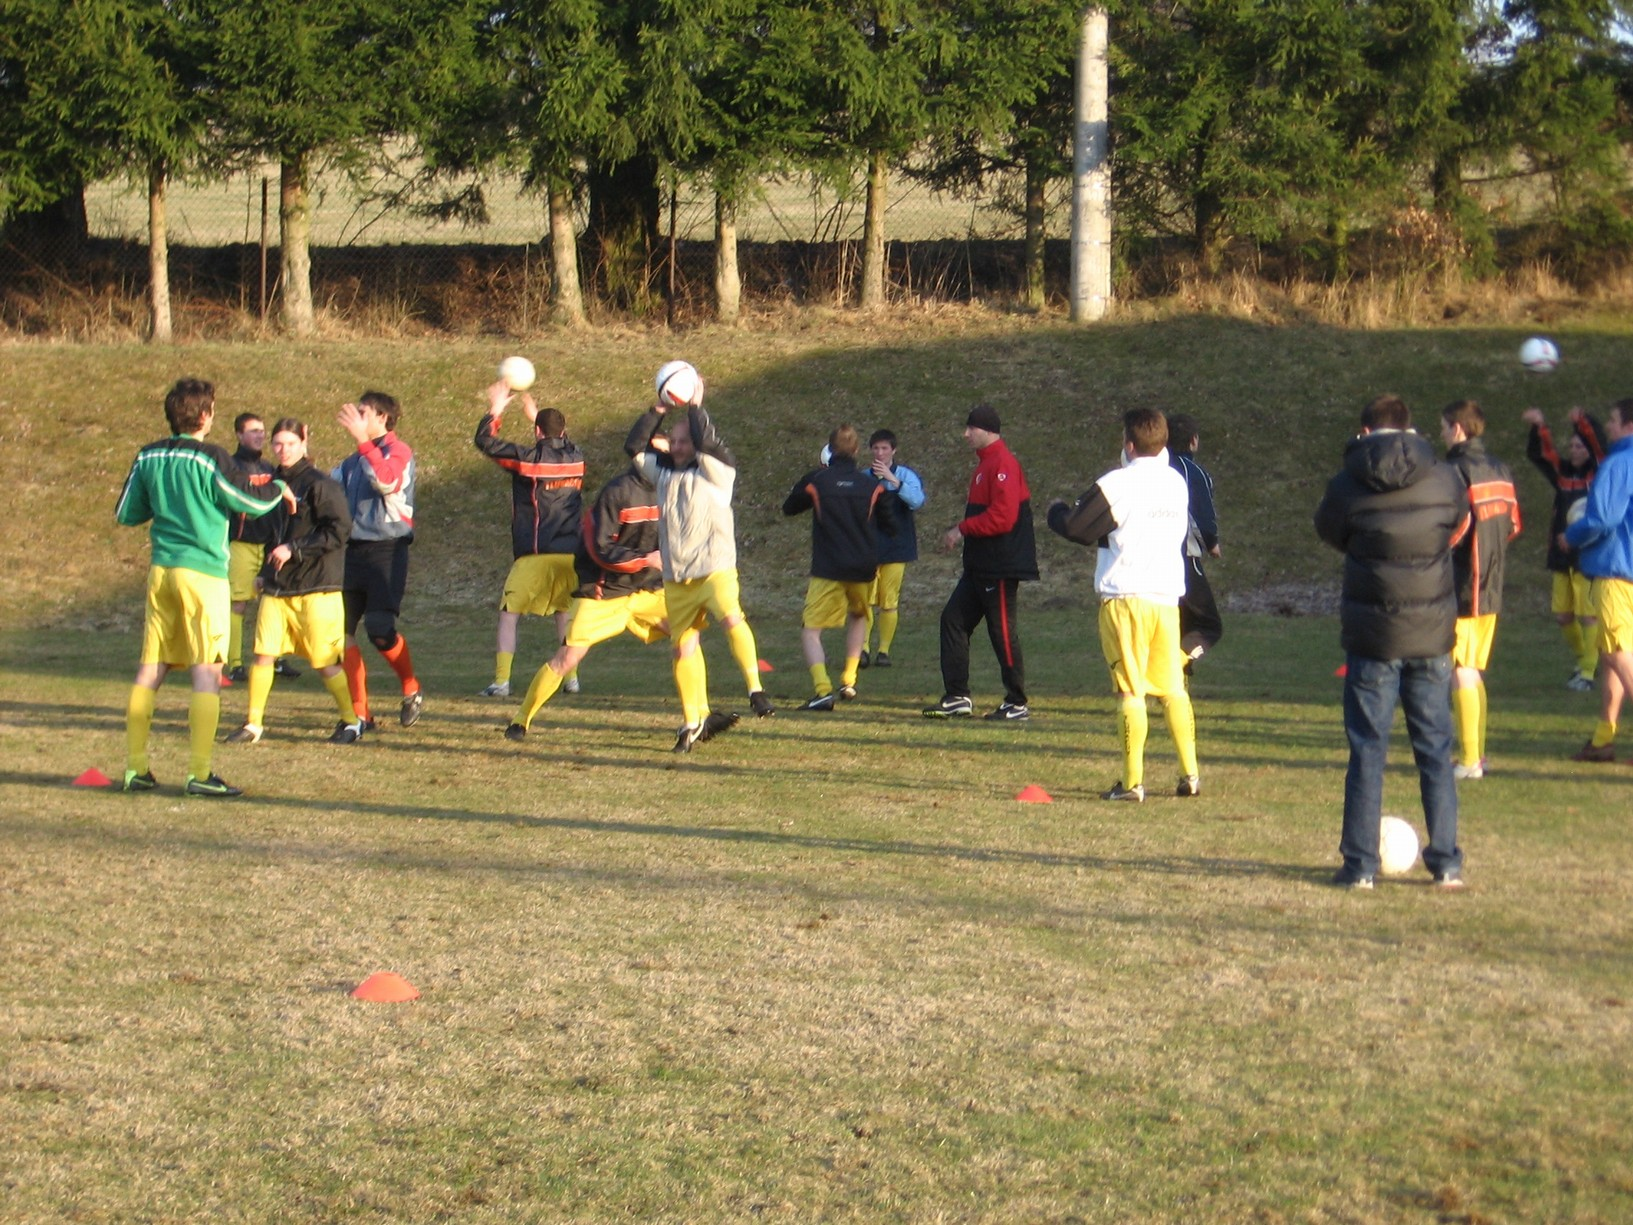 Trénink tlumačovský fotbalistů s trenéry Sparty